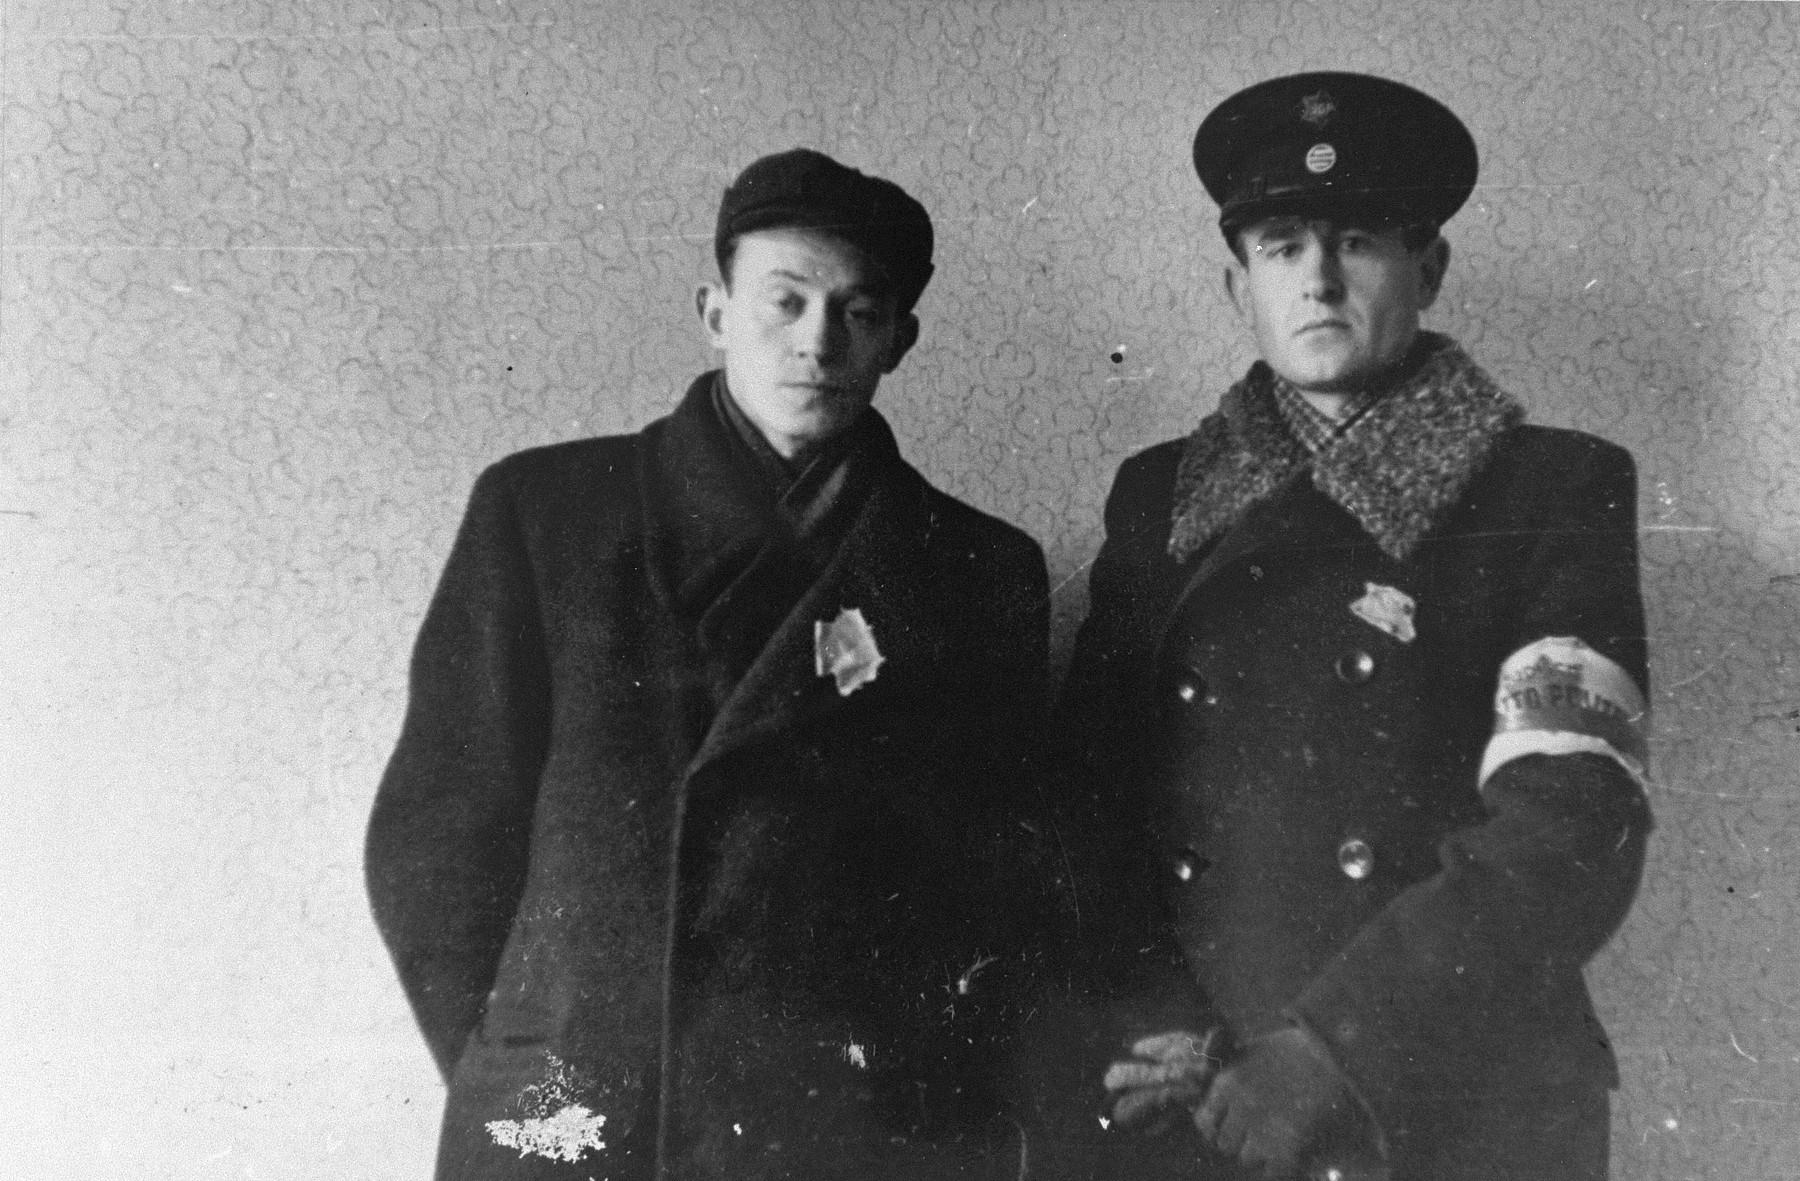 Photographer Zvi-Hirsh Kadushin (George Kadish, left) poses with deputy police chief Yehuda Zupovitz (right) in the Kovno ghetto.